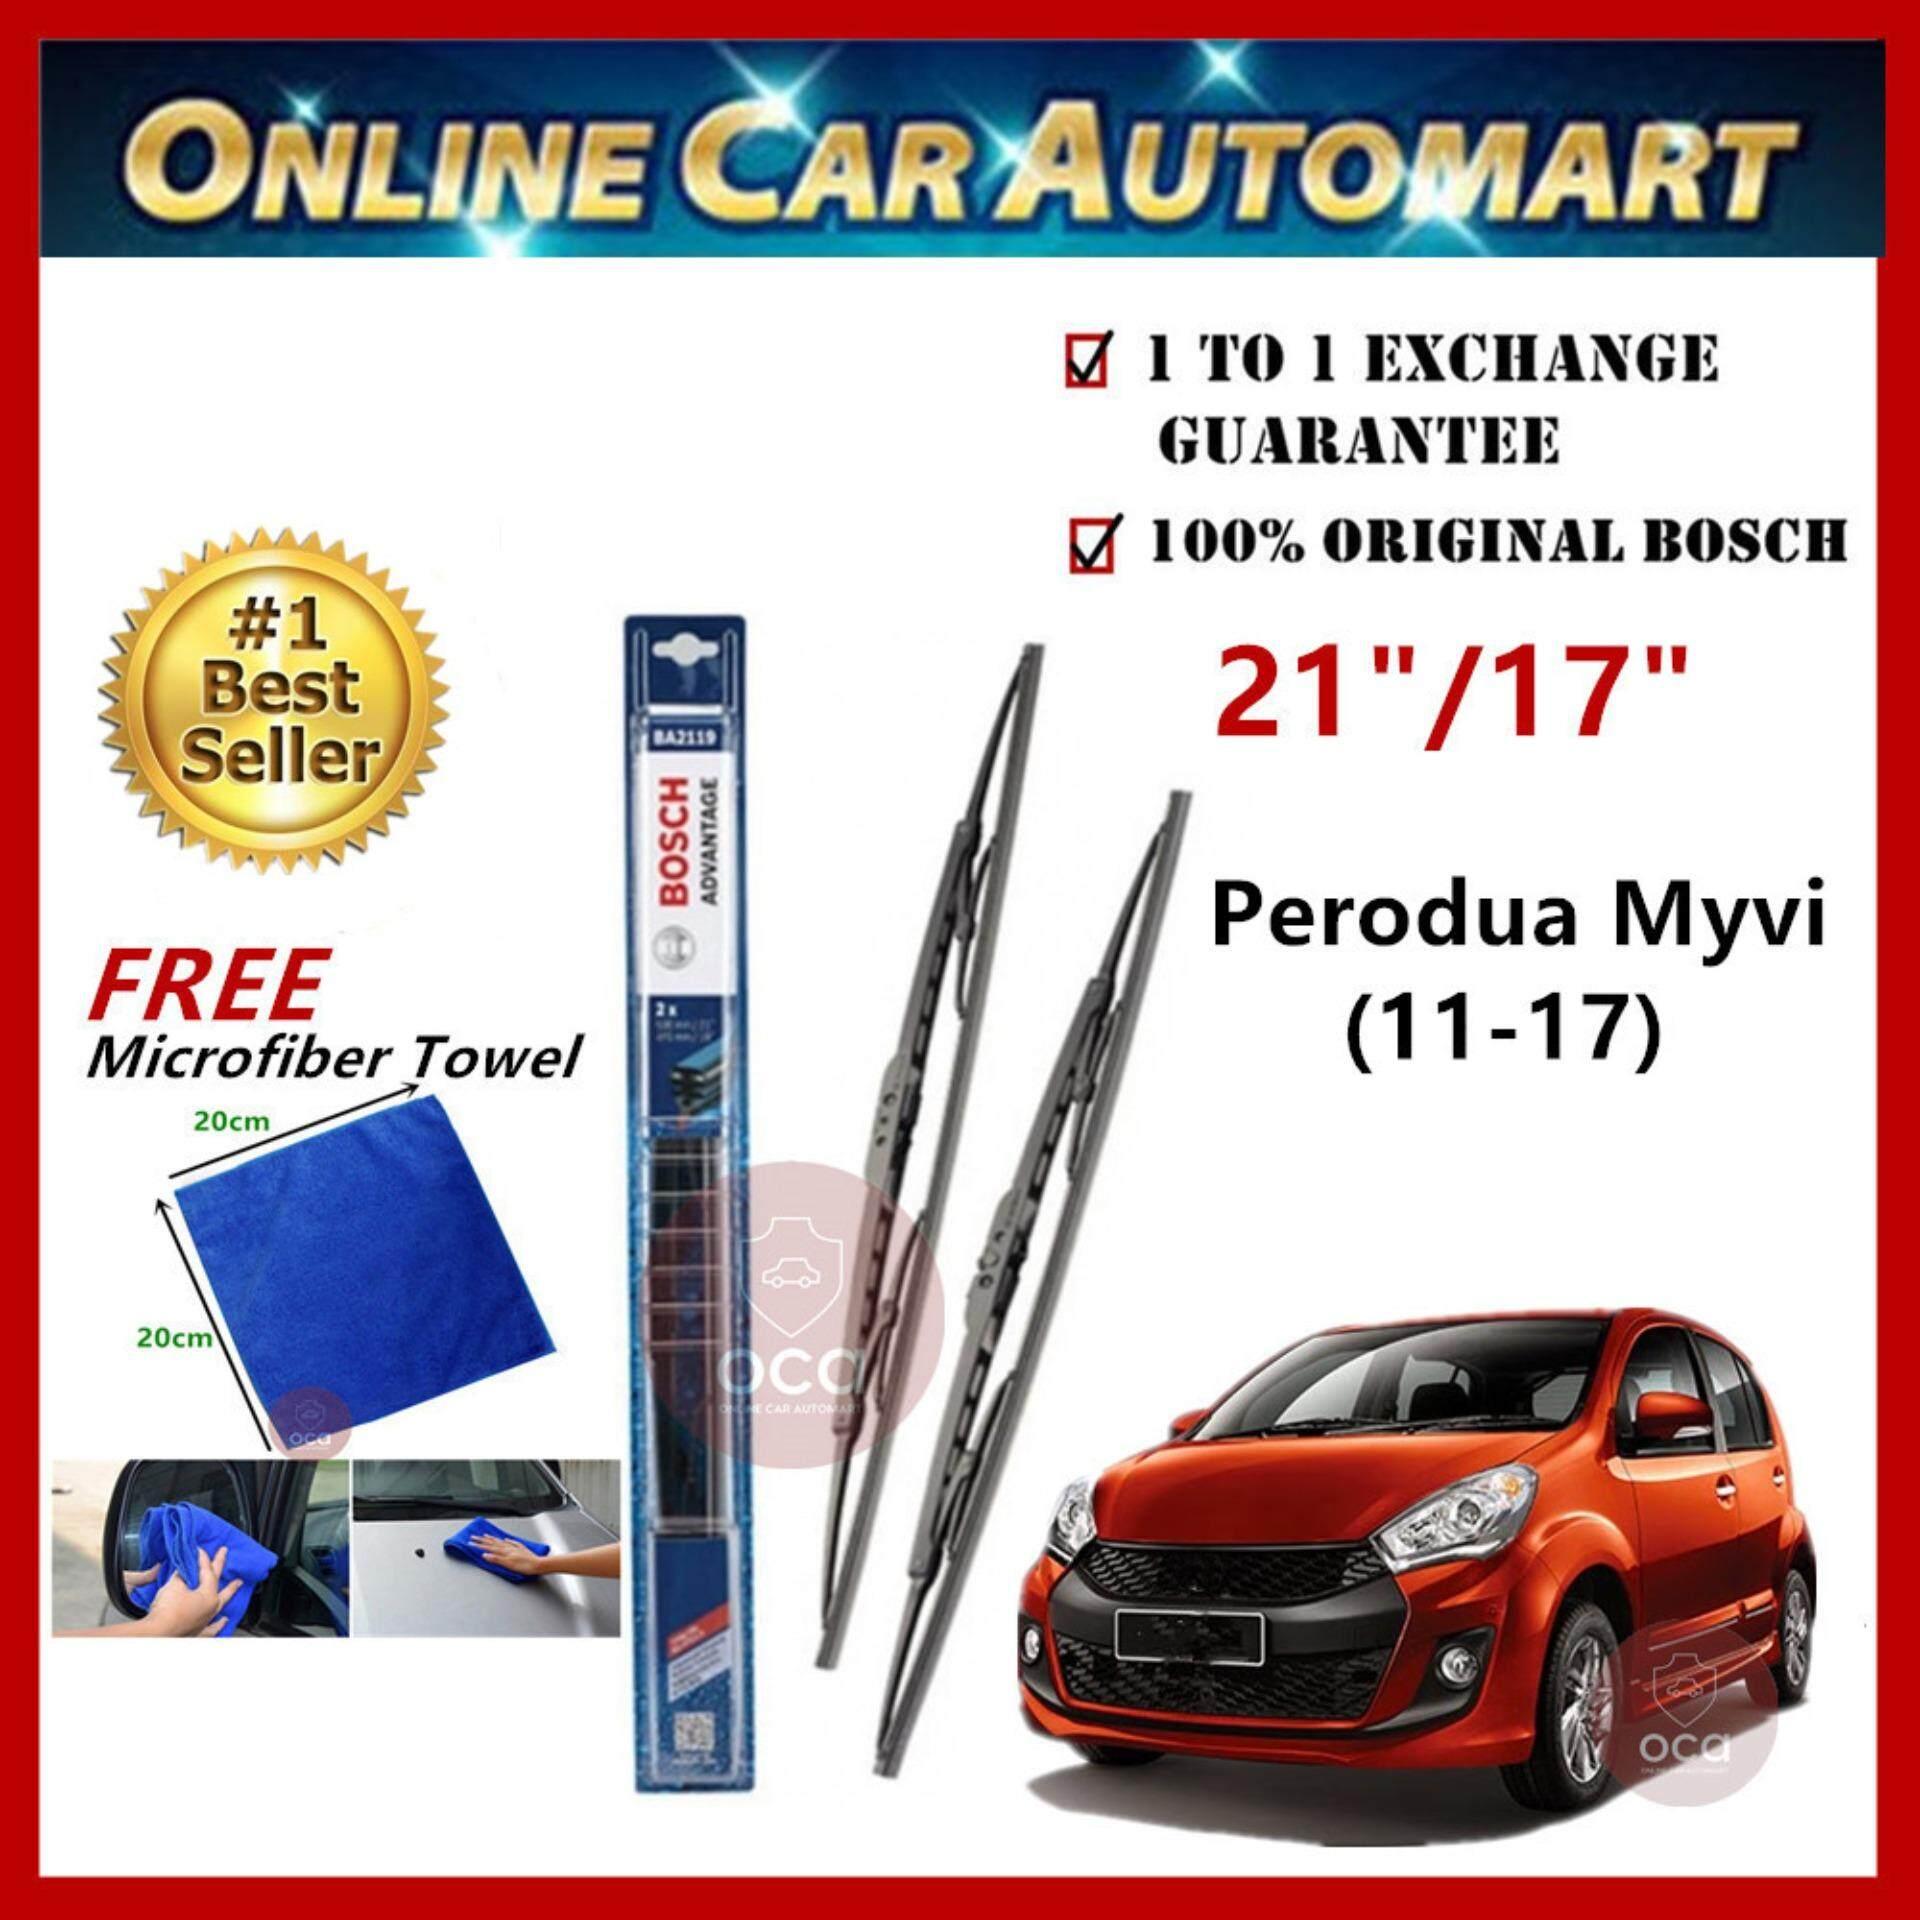 Bosch Advantage BA2017 Wiper Blade 20\'\'/17\'\' (Set) for Perodua Myvi Lagi Best/Icon 2011-2017